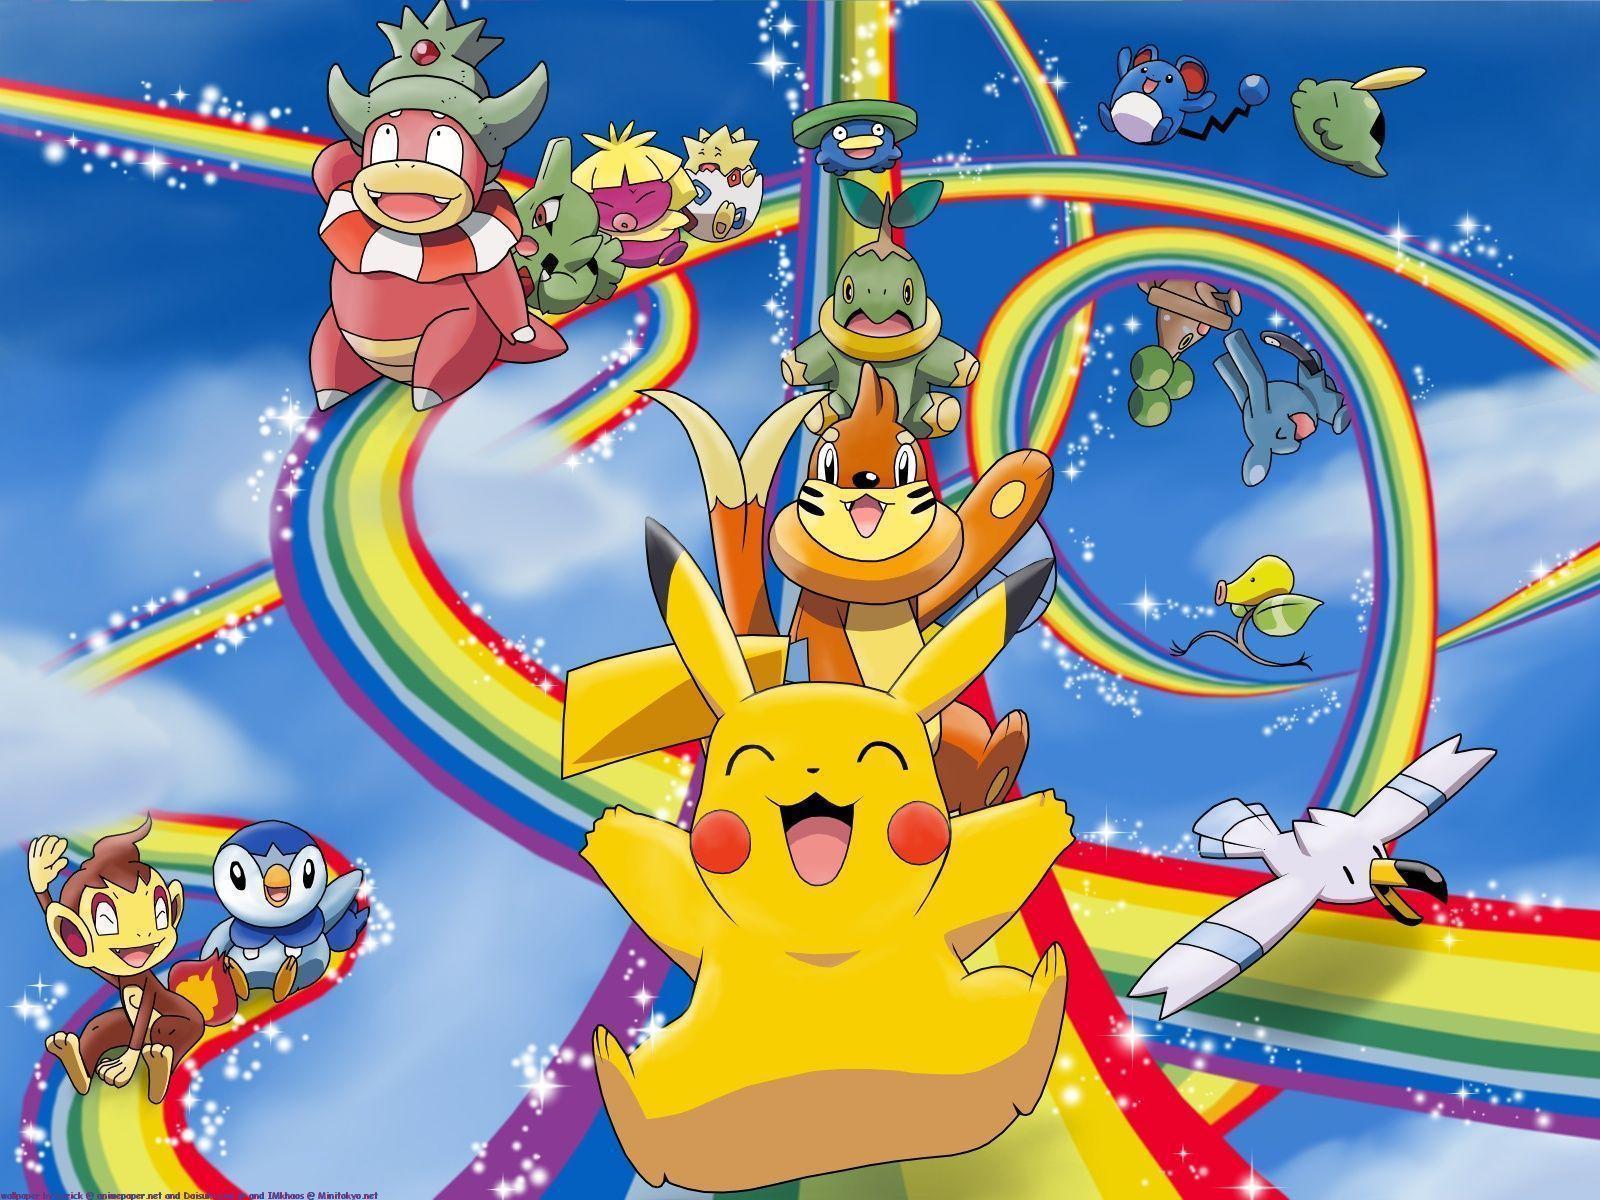 Original Pokemon Wallpapers - Wallpaper Cave Original Pokemon Wallpaper